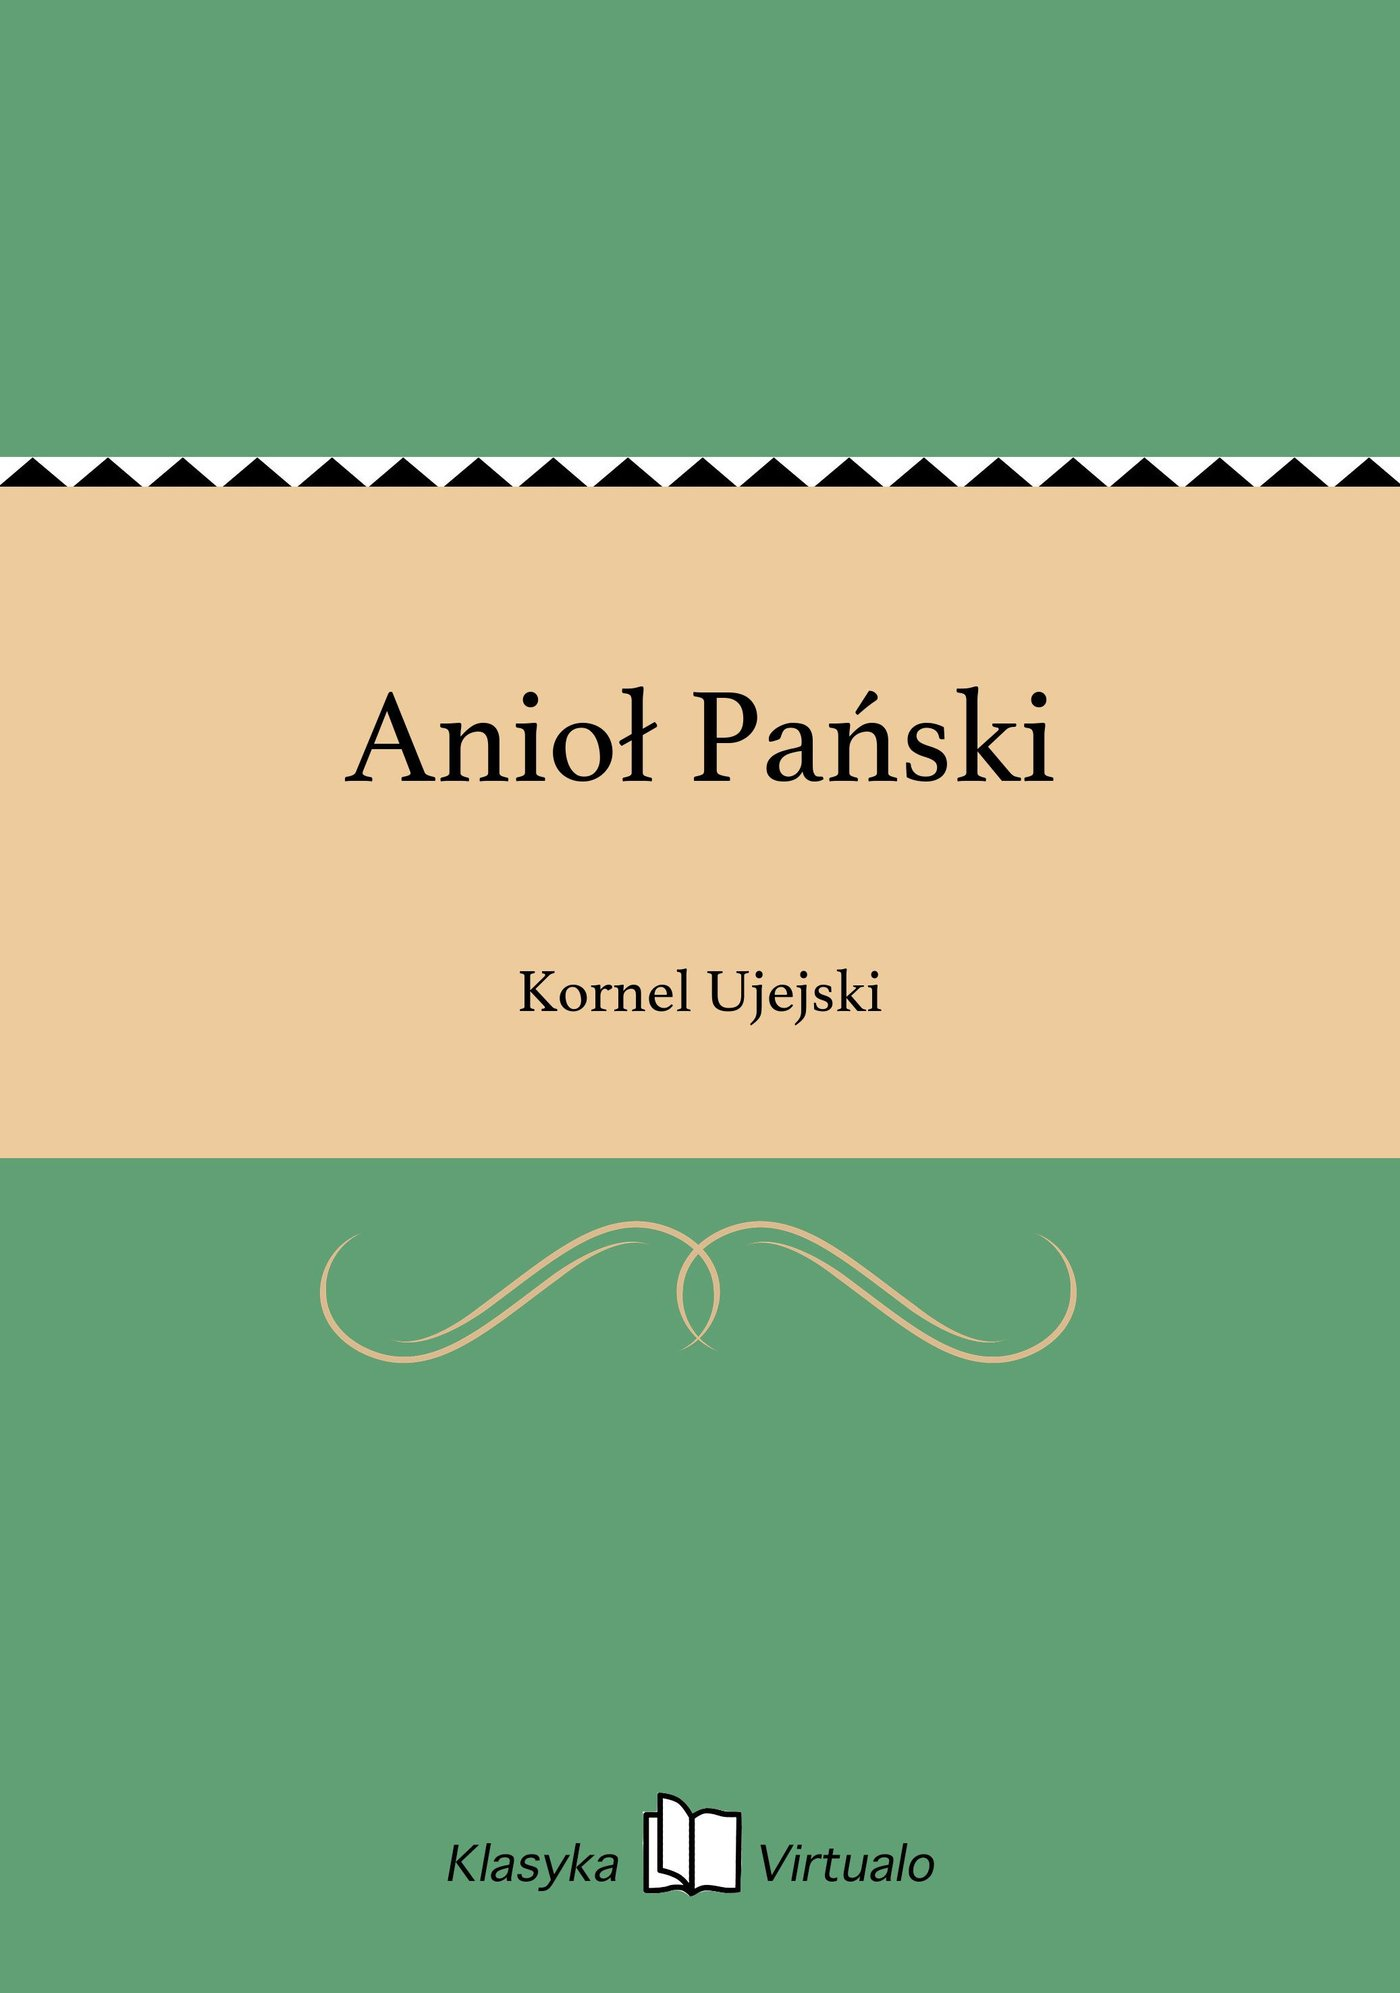 Anioł Pański - Ebook (Książka EPUB) do pobrania w formacie EPUB